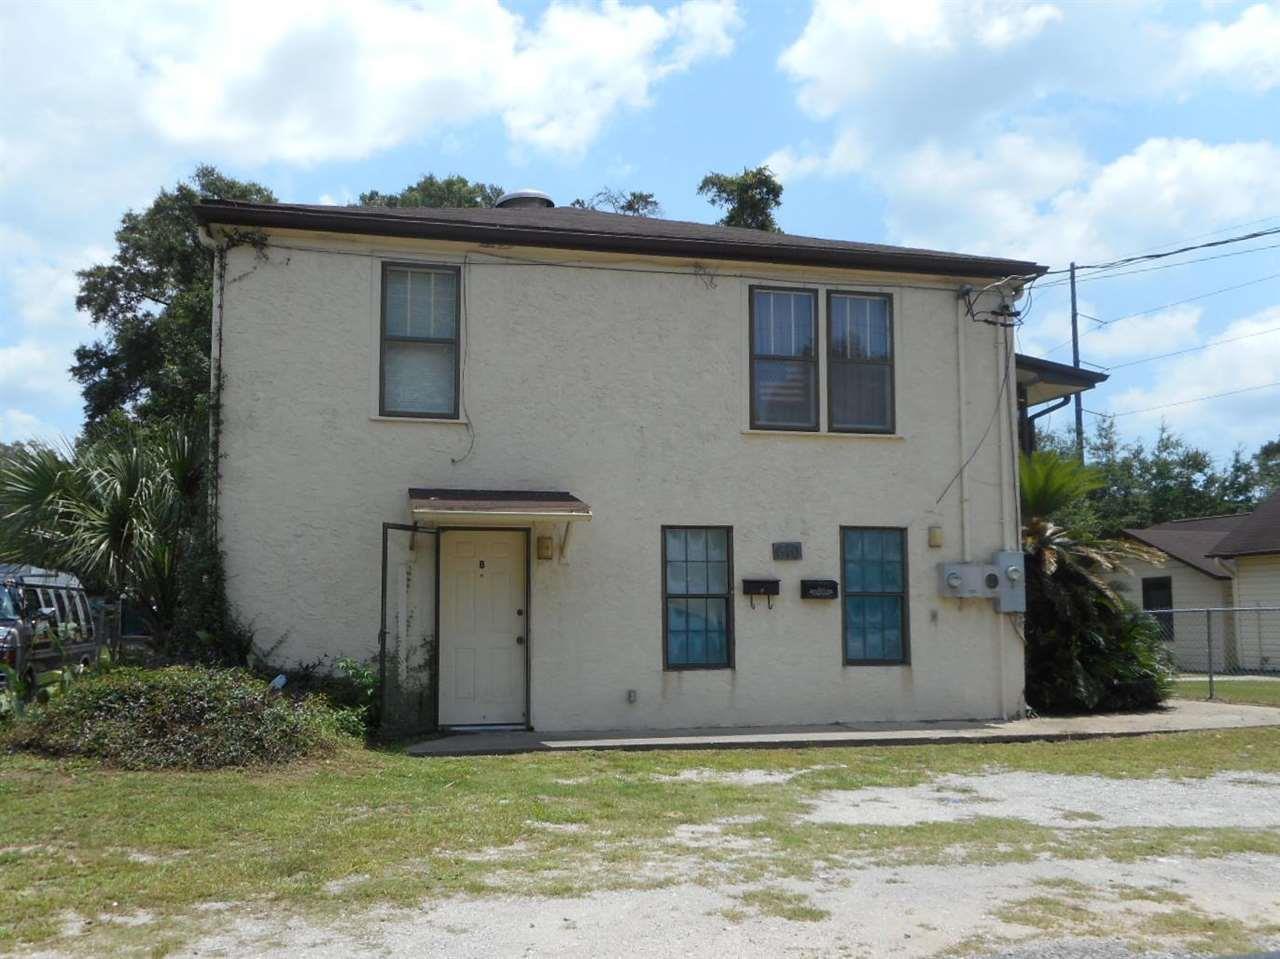 610 N Q ST, Pensacola, Florida